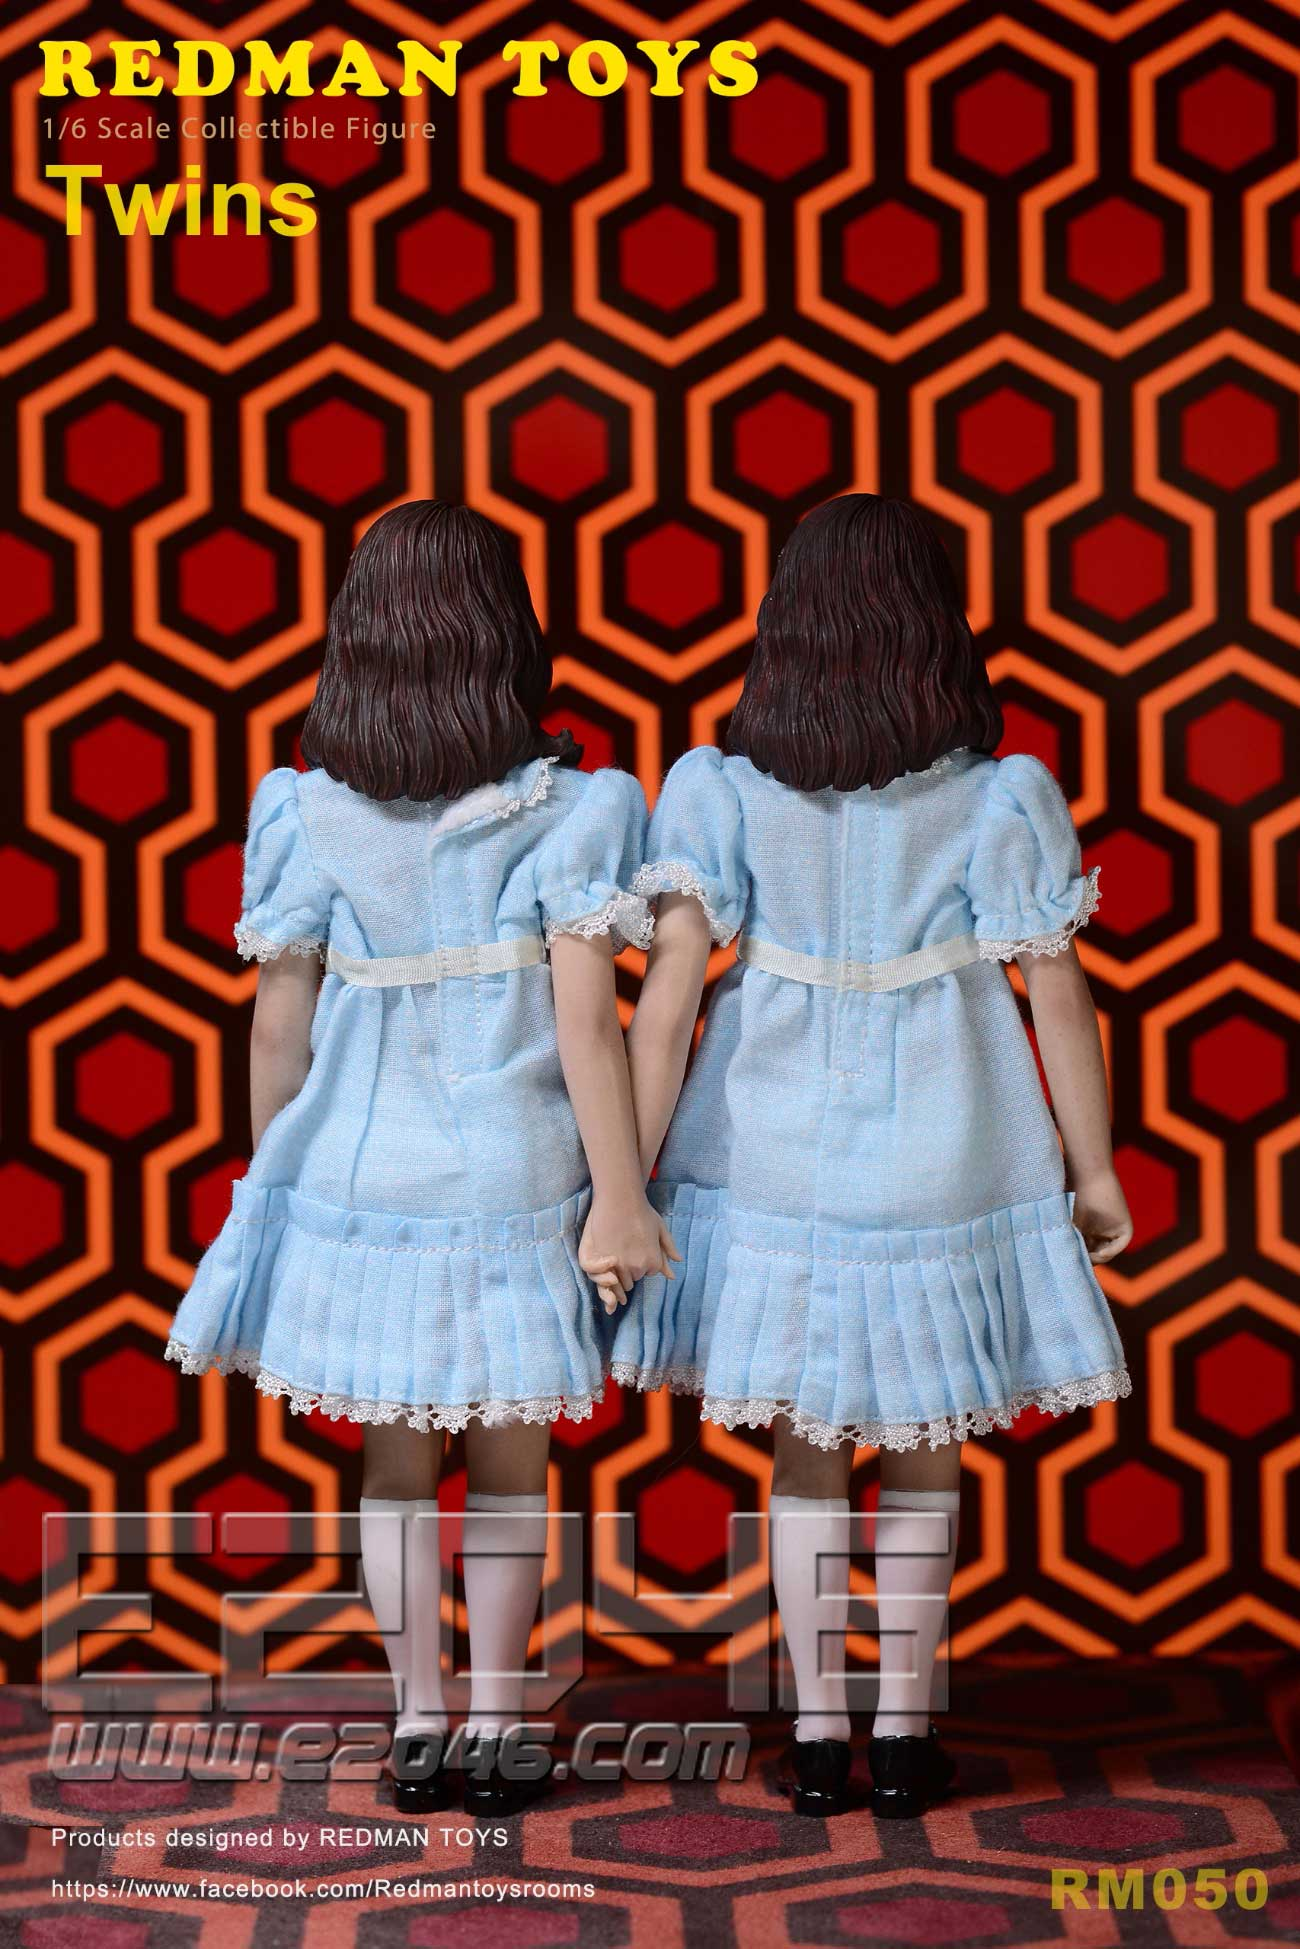 Twins (DOLL)